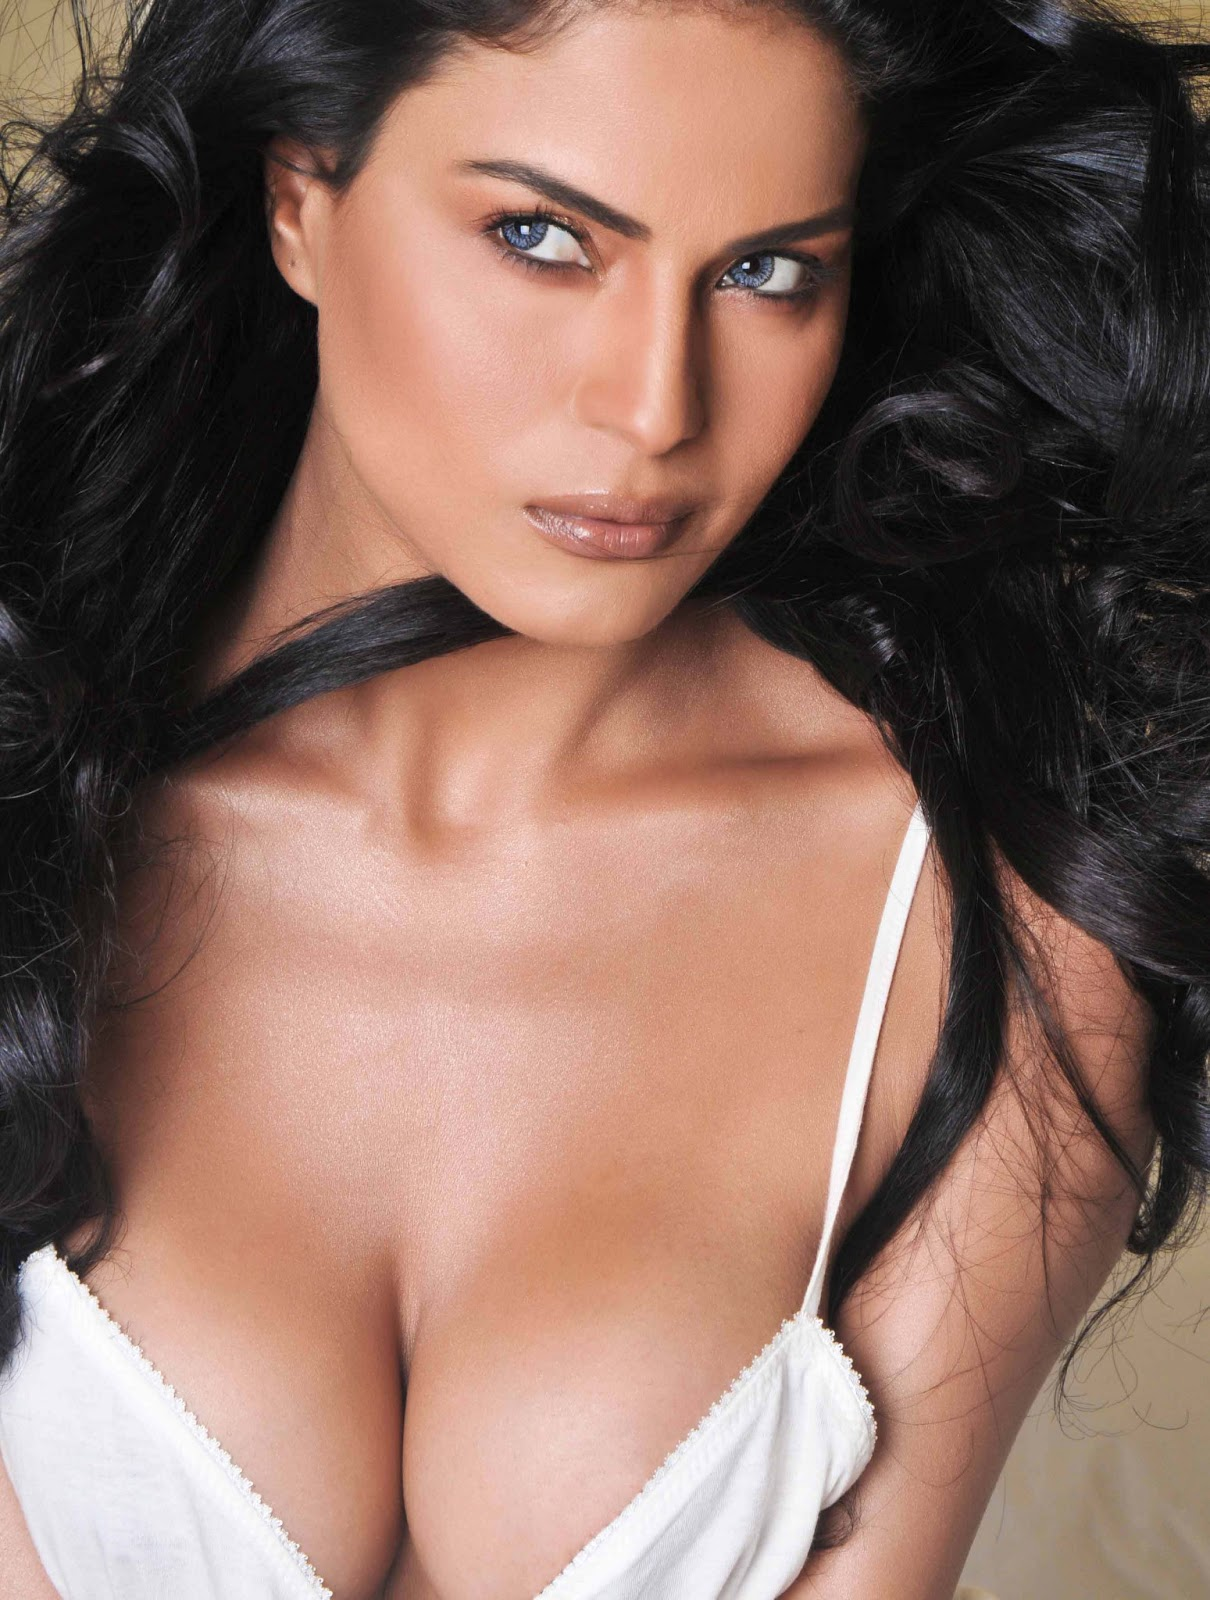 ... Actress Photoshoots Bollywood Bollywood Actress Bollywood Photoshoot